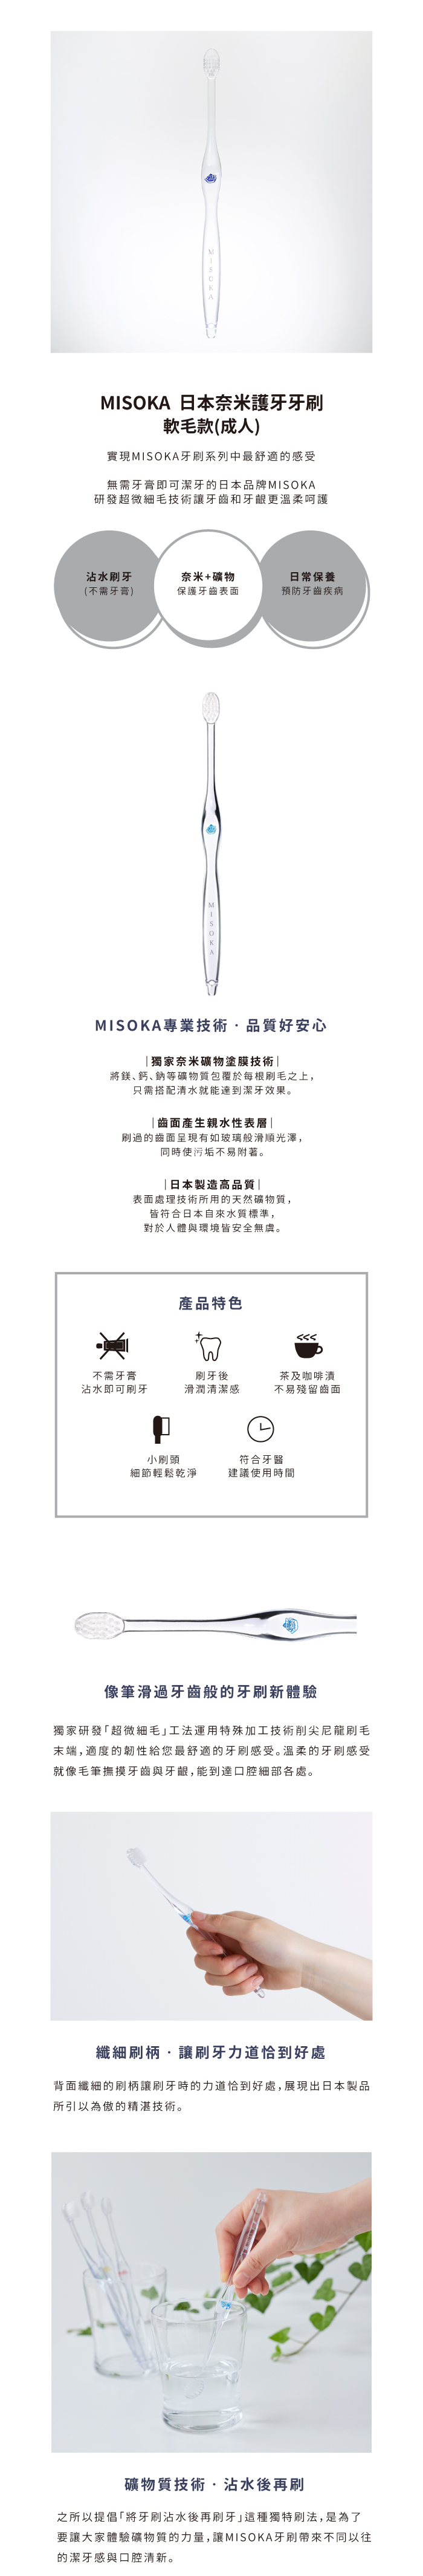 MISOKA │  COMFORT 軟毛款頂級免沾牙膏牙刷 (日本製 / 朱色 / 成人)